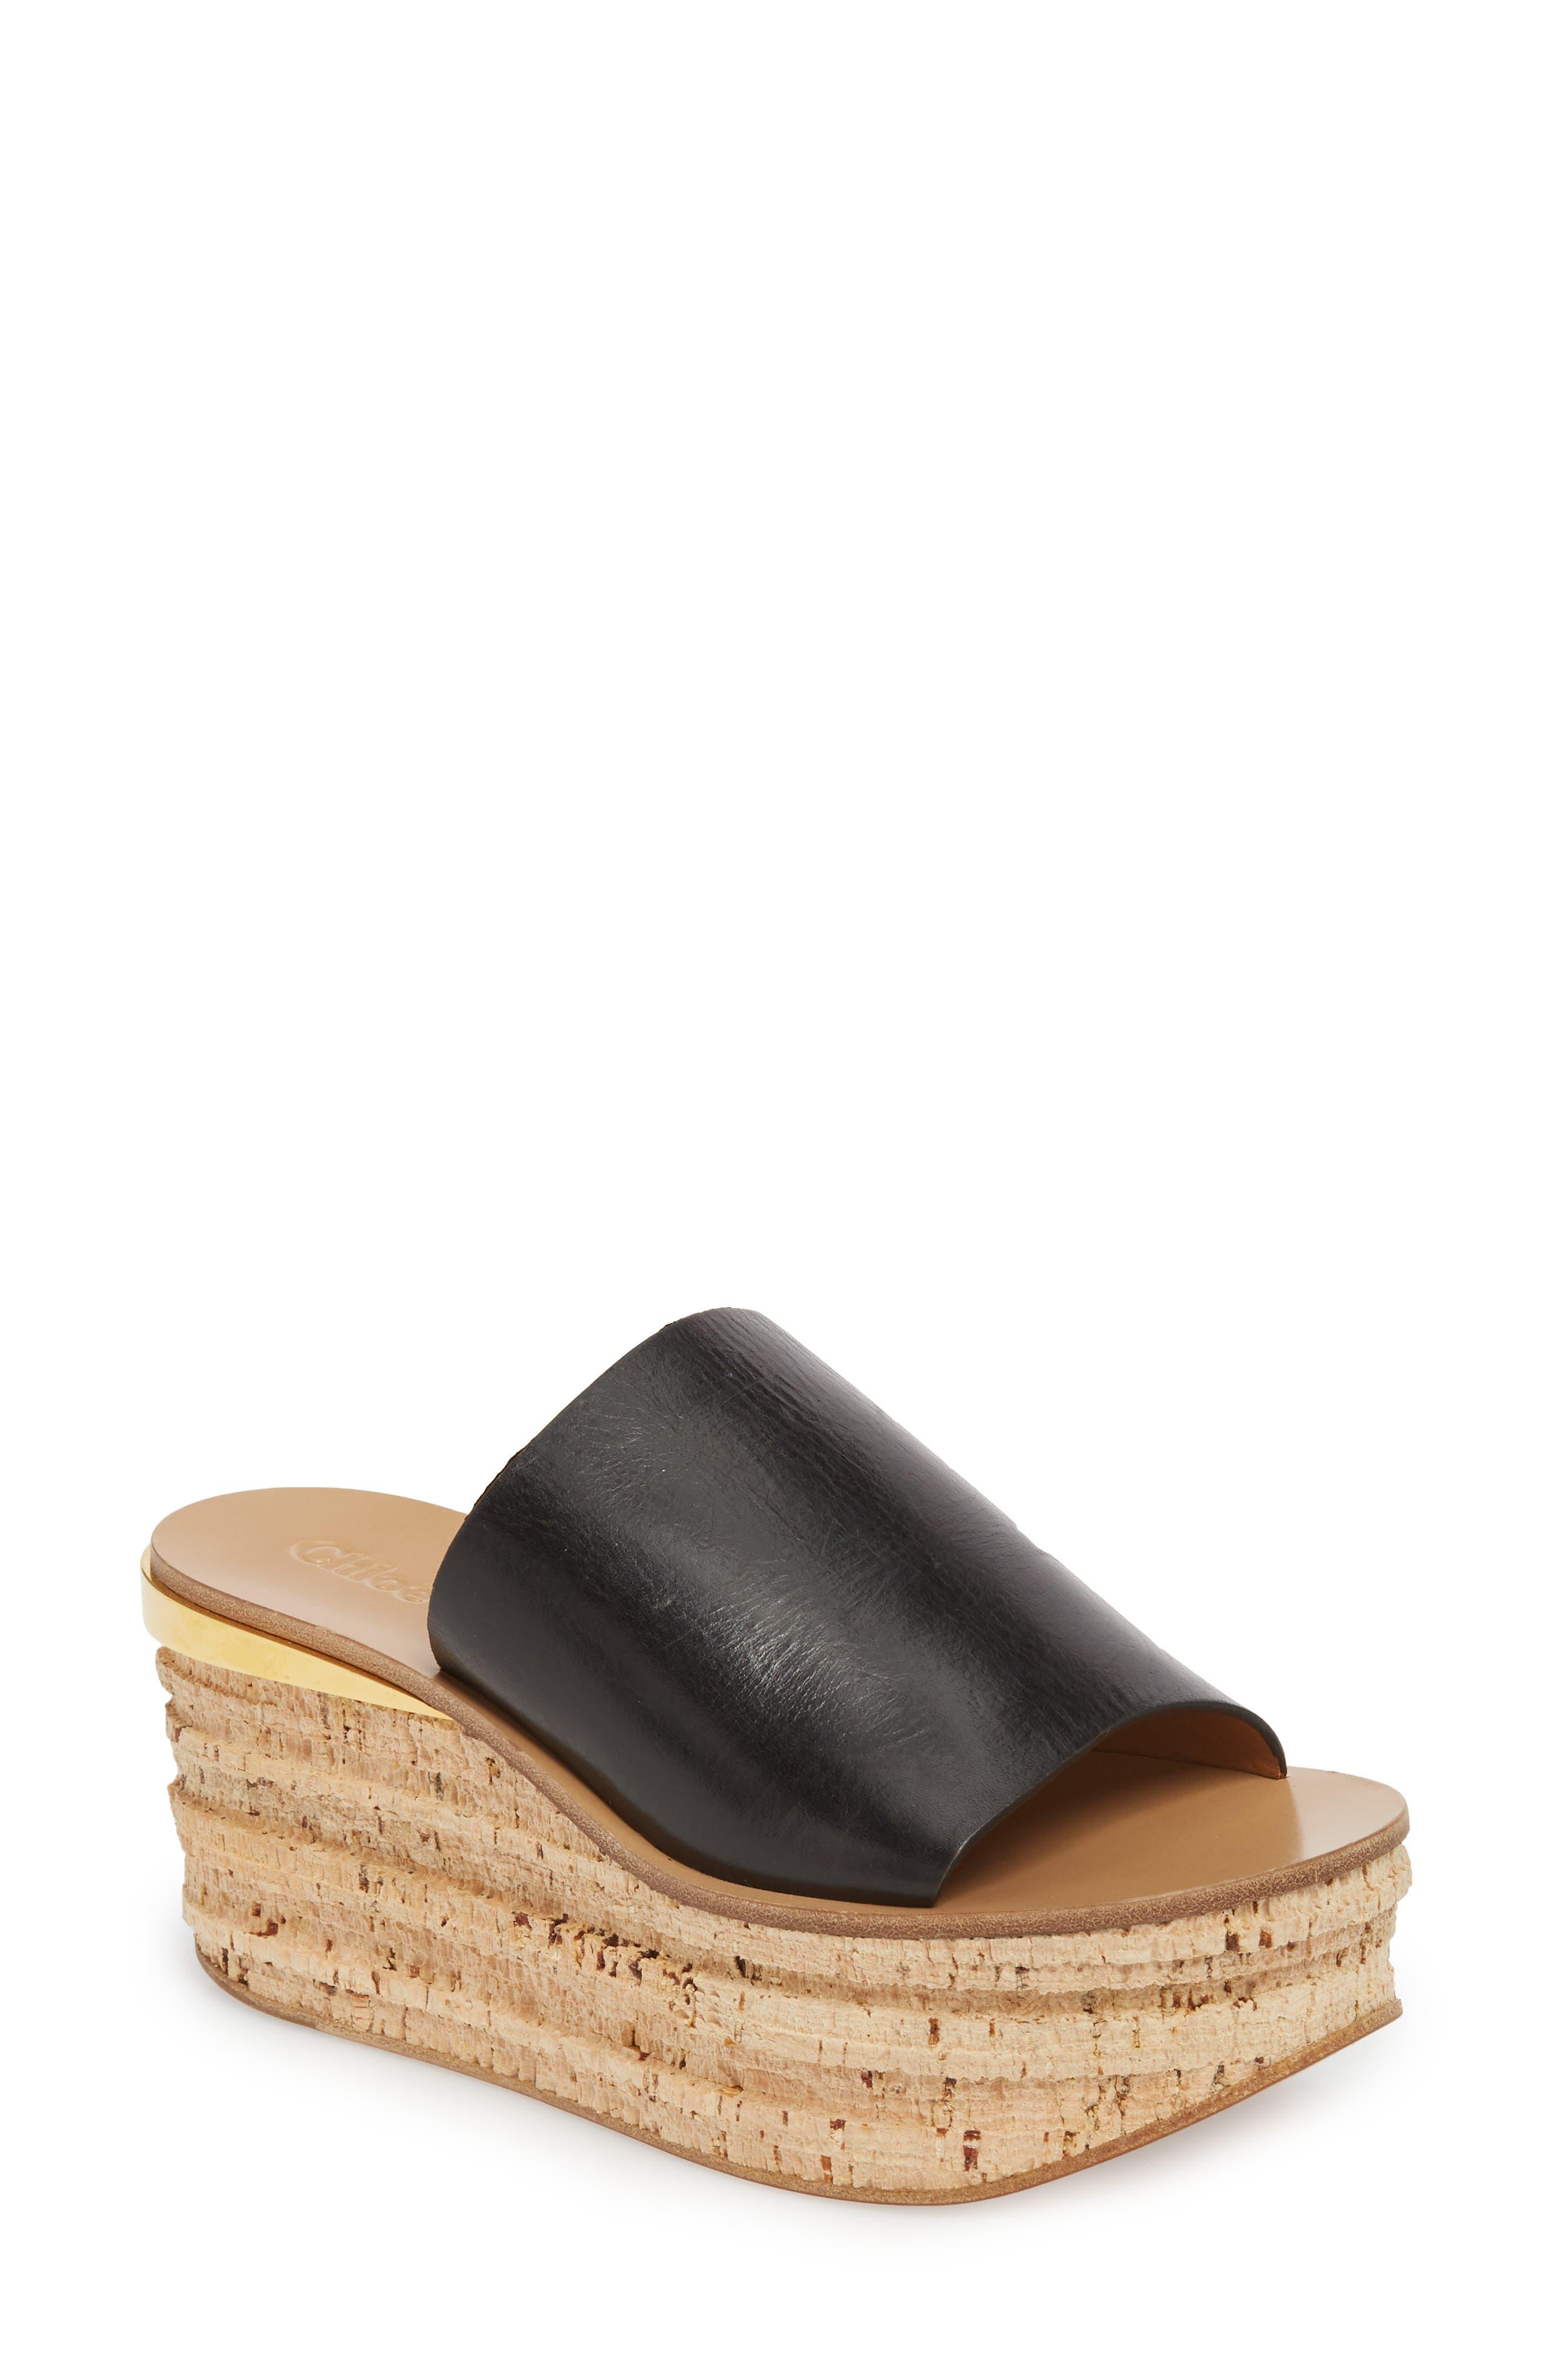 CHLOÉ Camille Cork Platform Sandal, Main, color, BLACK